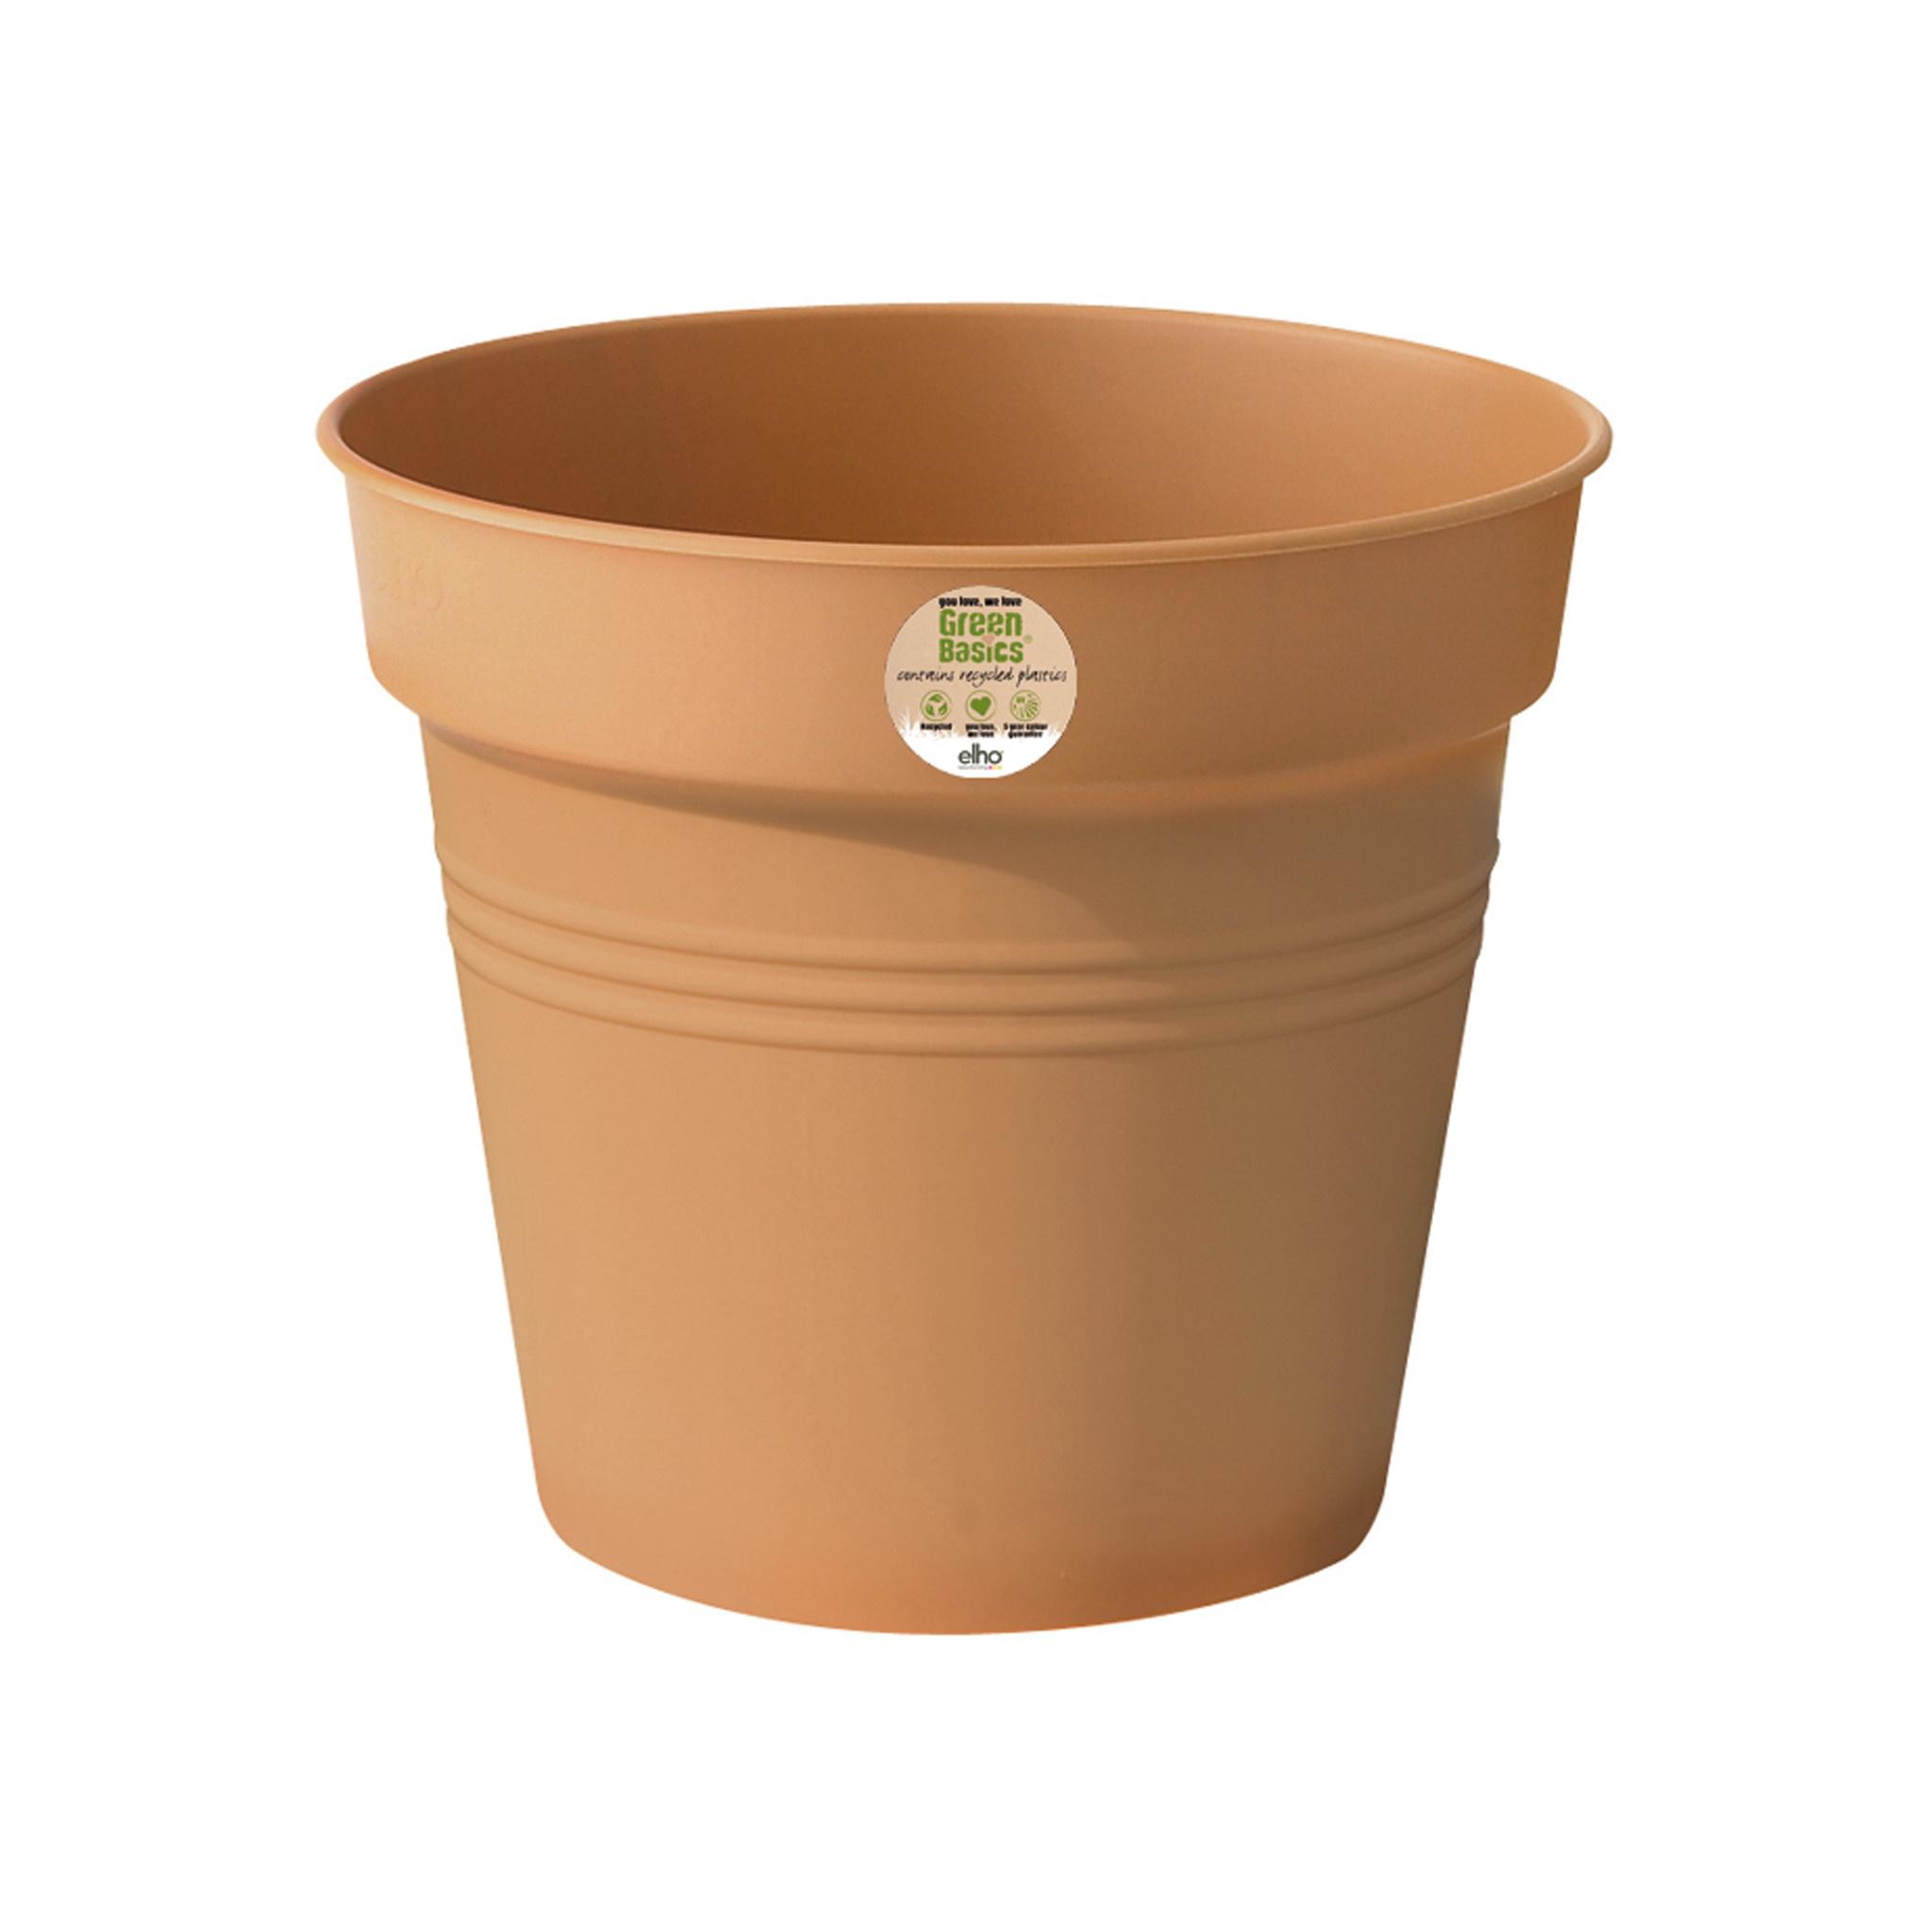 Elho Green Basics Kweekpot